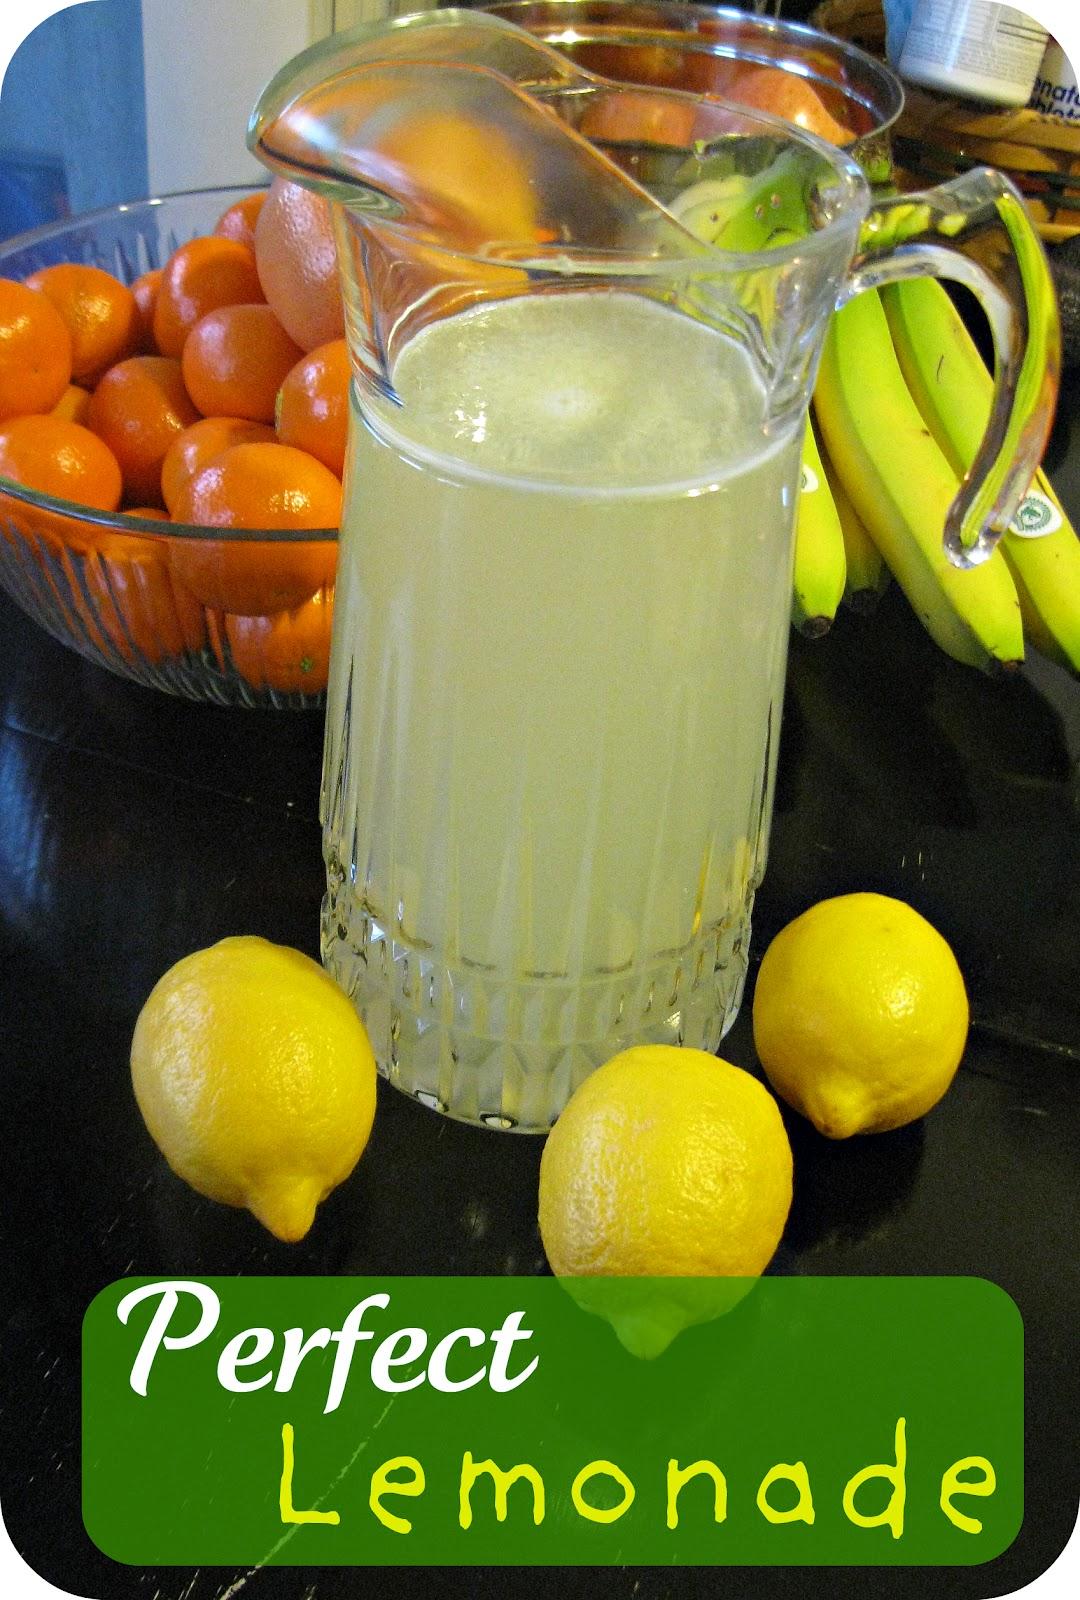 lemonade lavender lemonade vermontucky lemonade watermelon lemonade ...